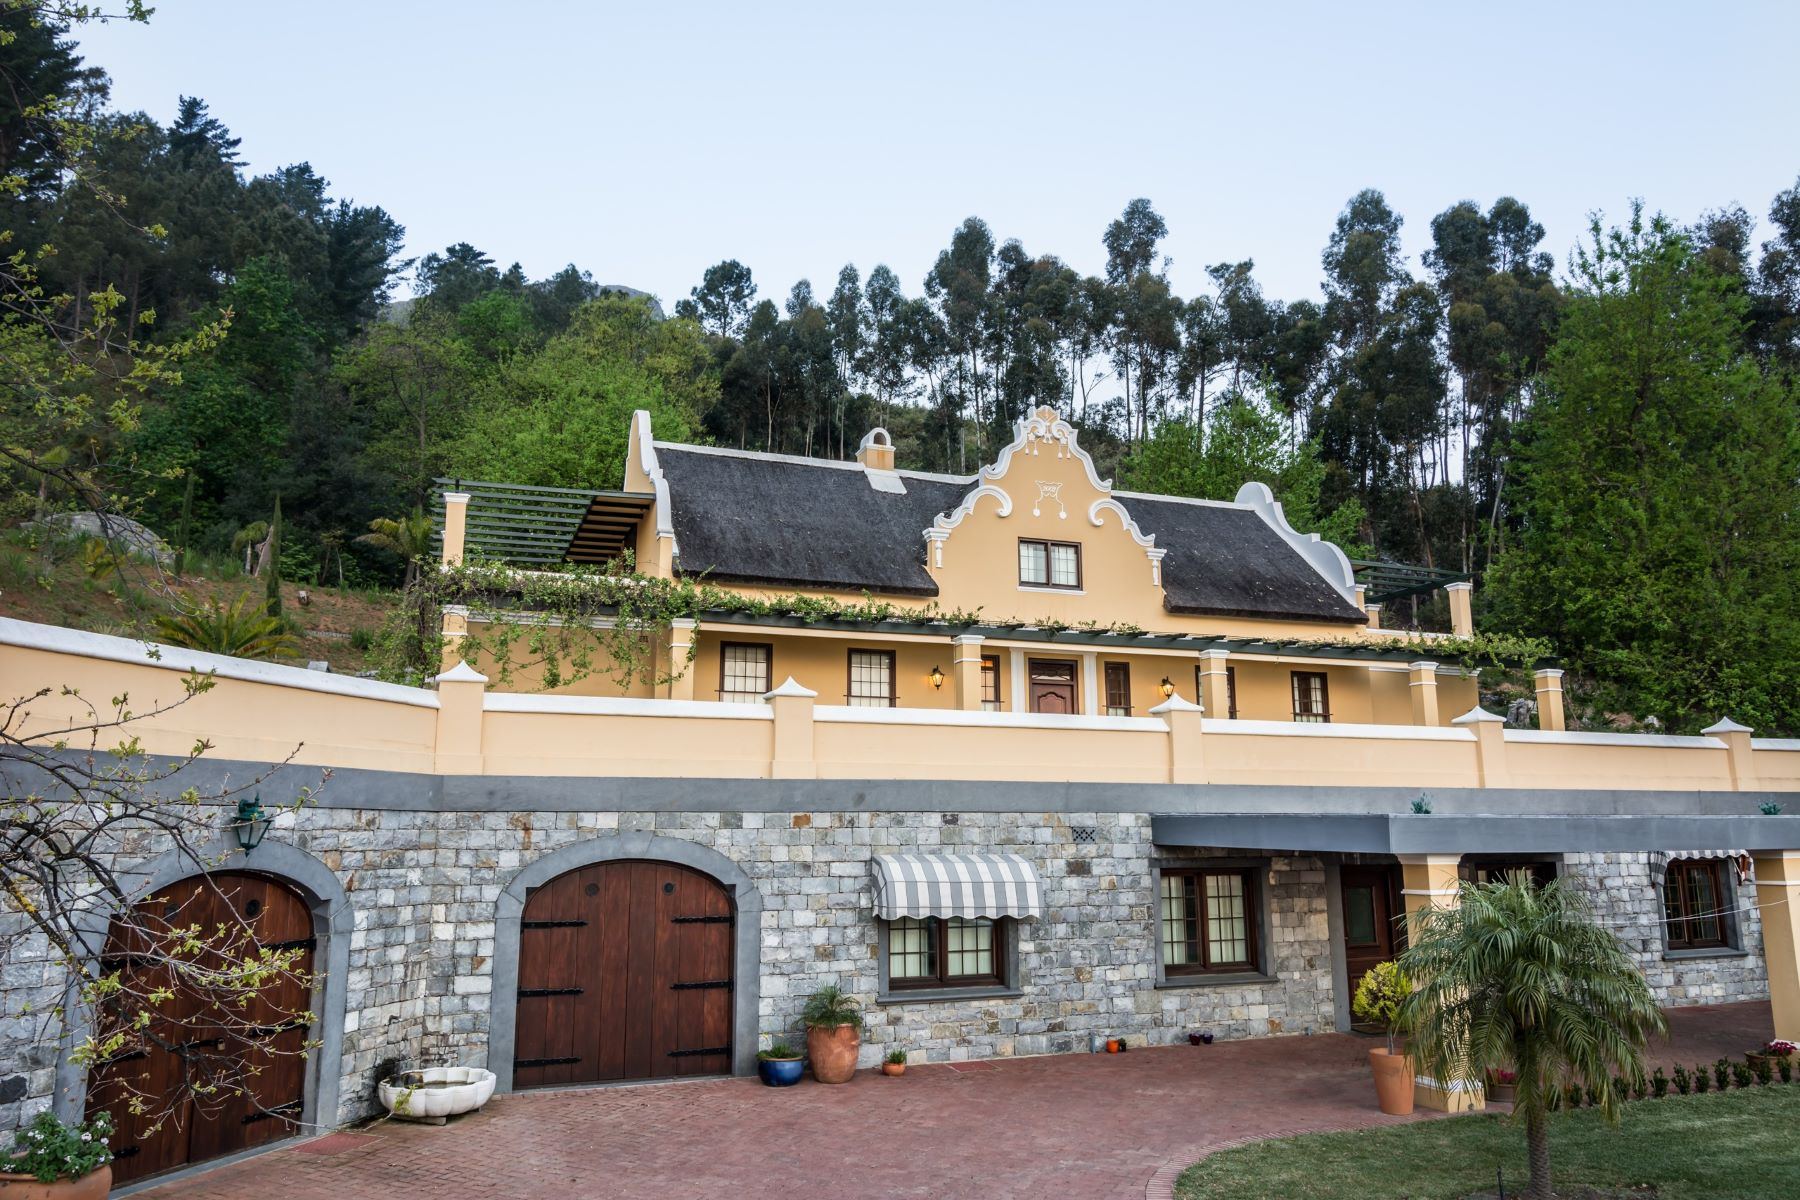 Nông trại / Trang trại / Vườn vì Bán tại Exclusive Stellenbosch Retreat Blaauwklippen, Stellenbosch, Western Cape, 7600 Nam Mỹ